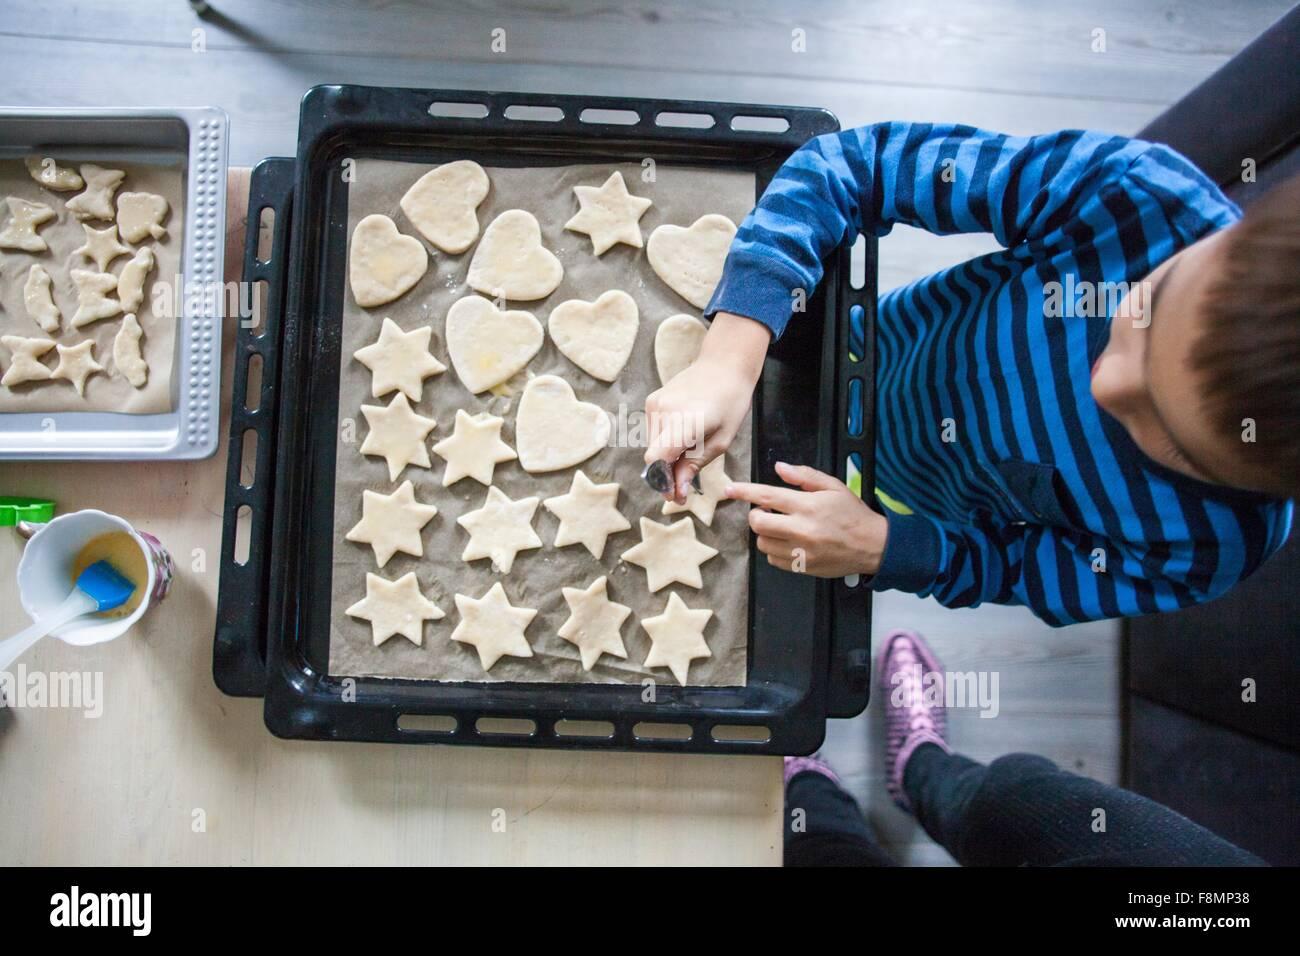 Junge machen Cookies, Draufsicht Stockbild